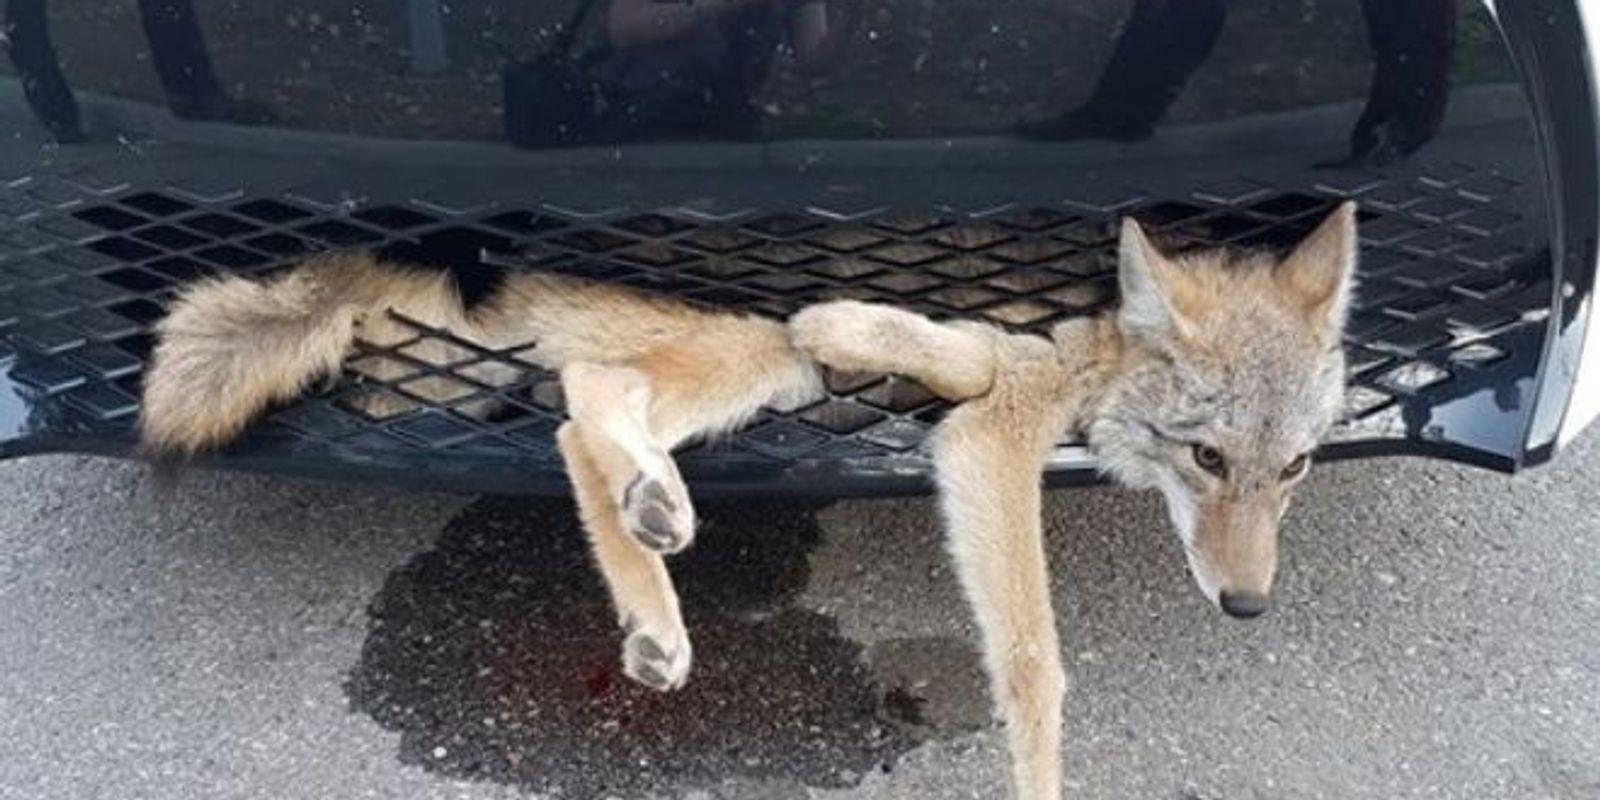 636408546662793435-coyote-embedded.jpg